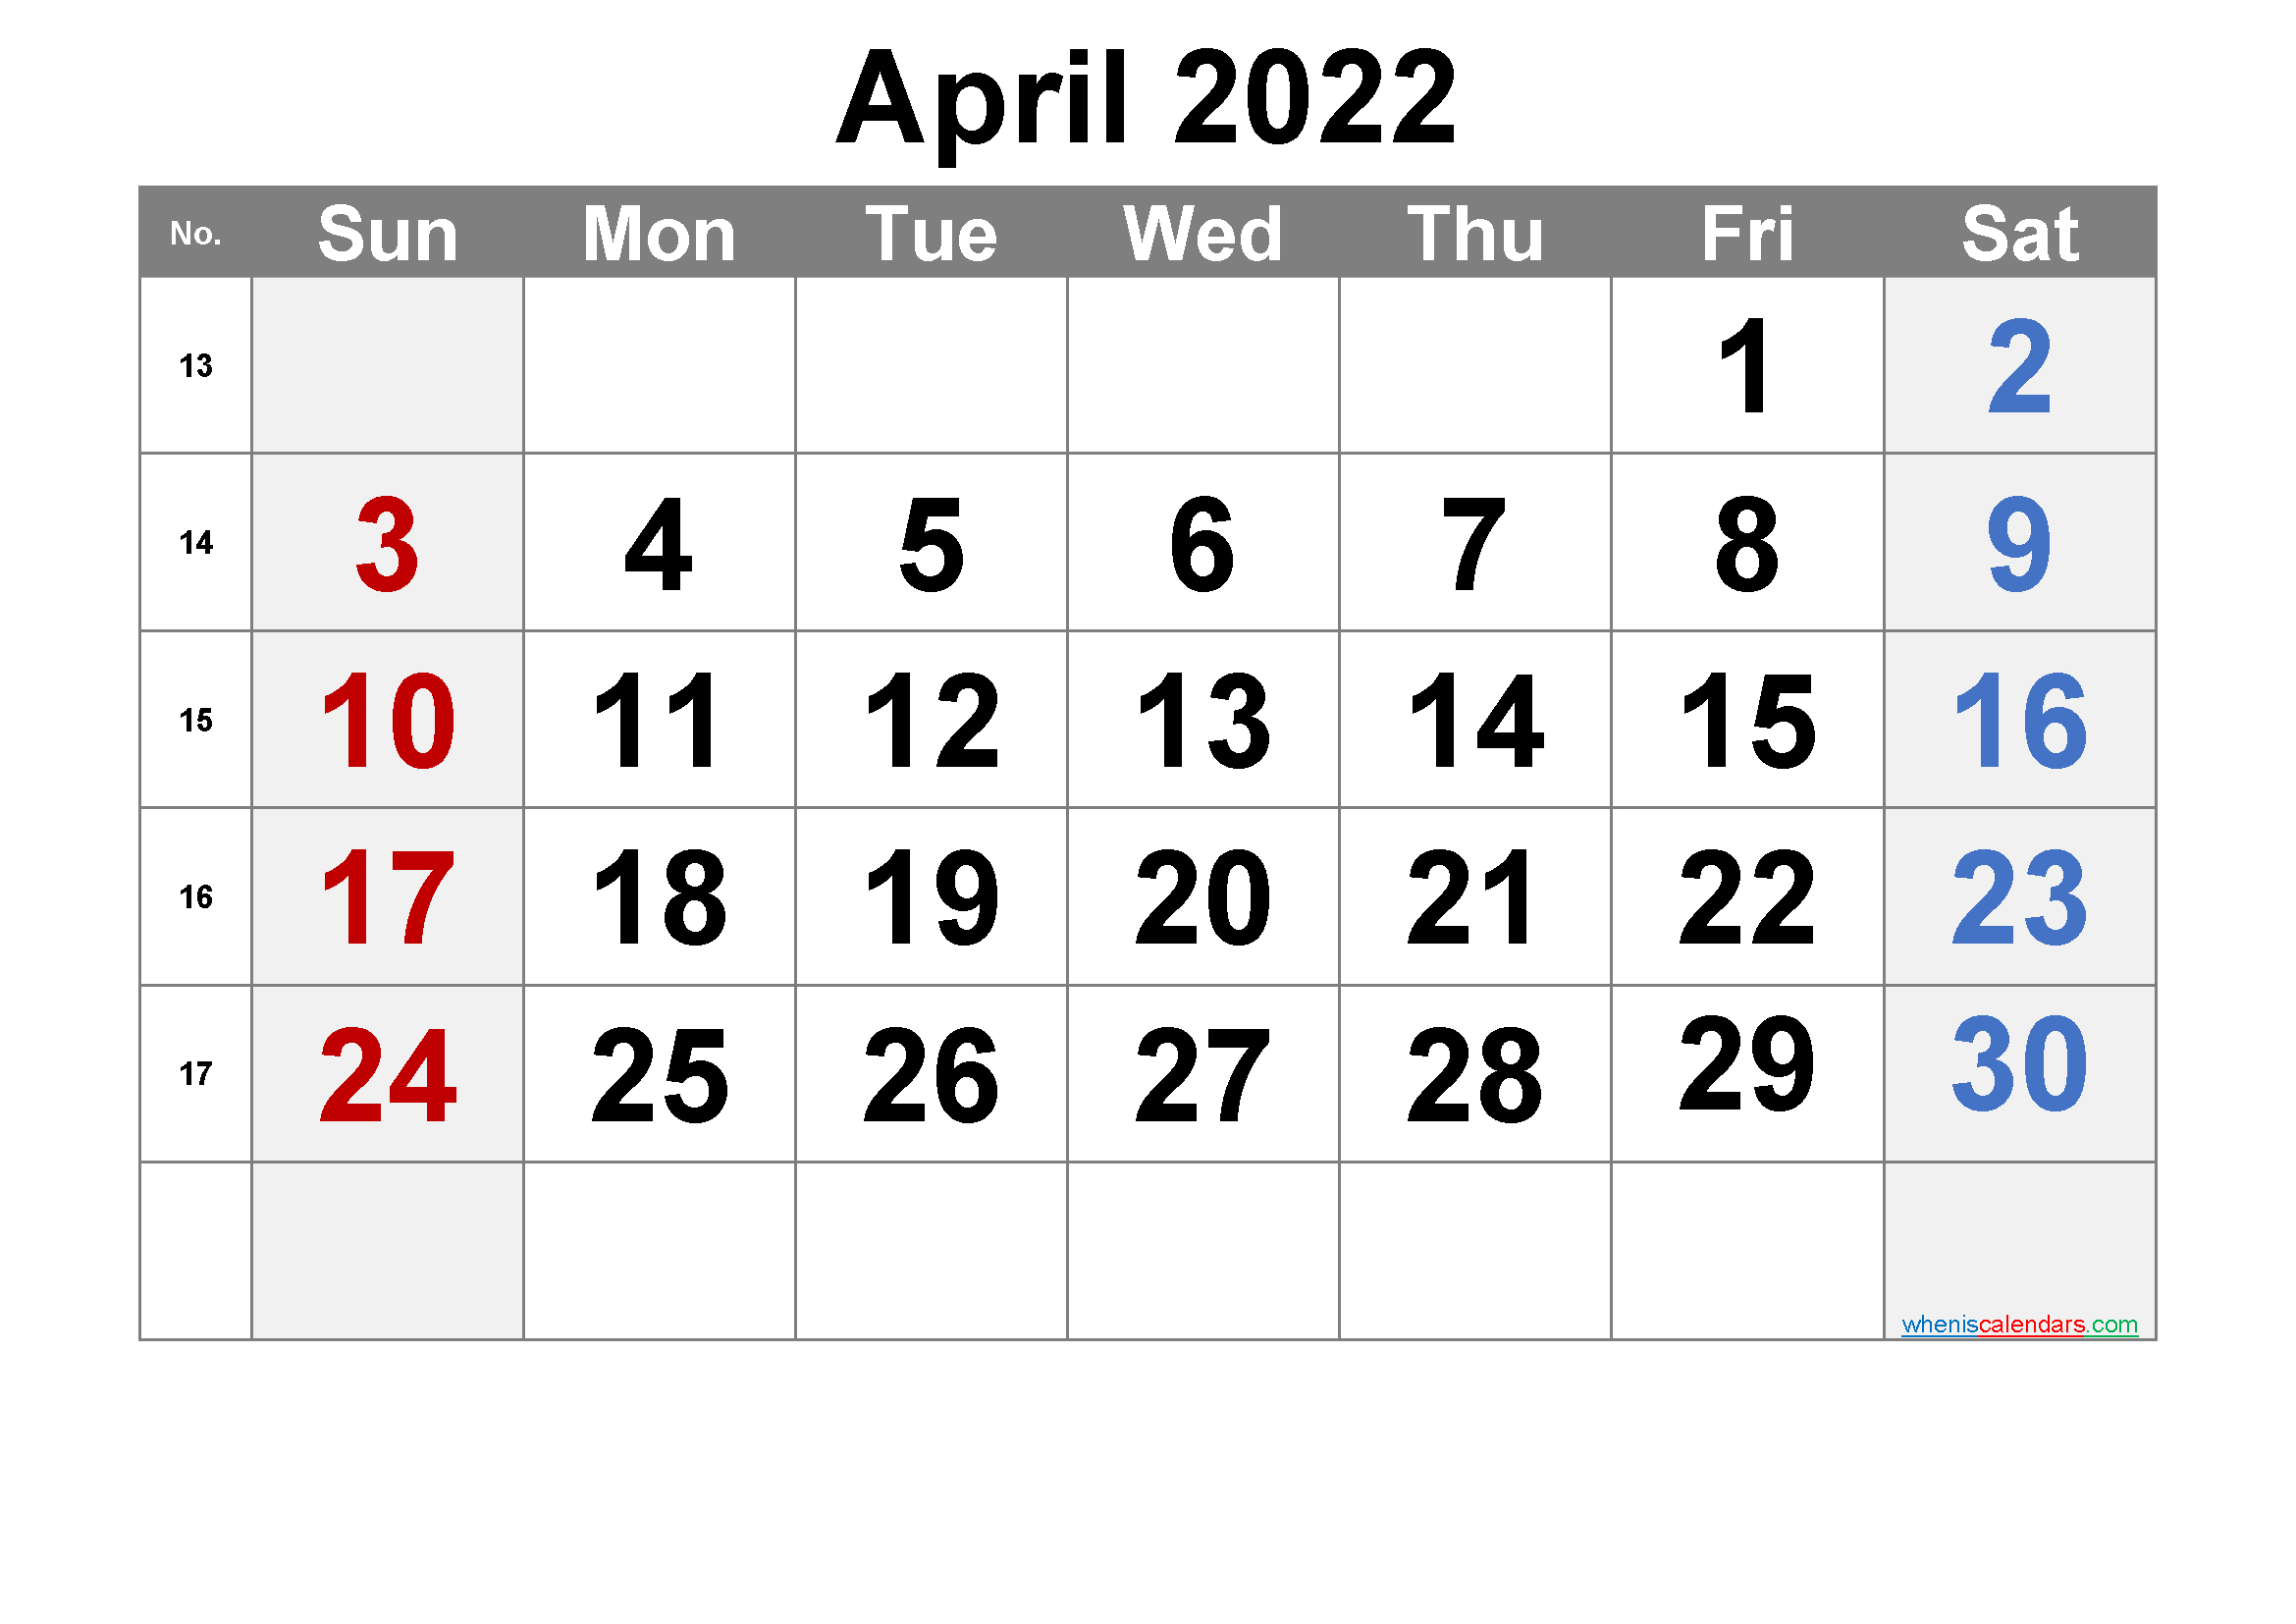 Free April 2022 Calendar With Week Numbers - Free inside April 2022 Printable Calendar Free